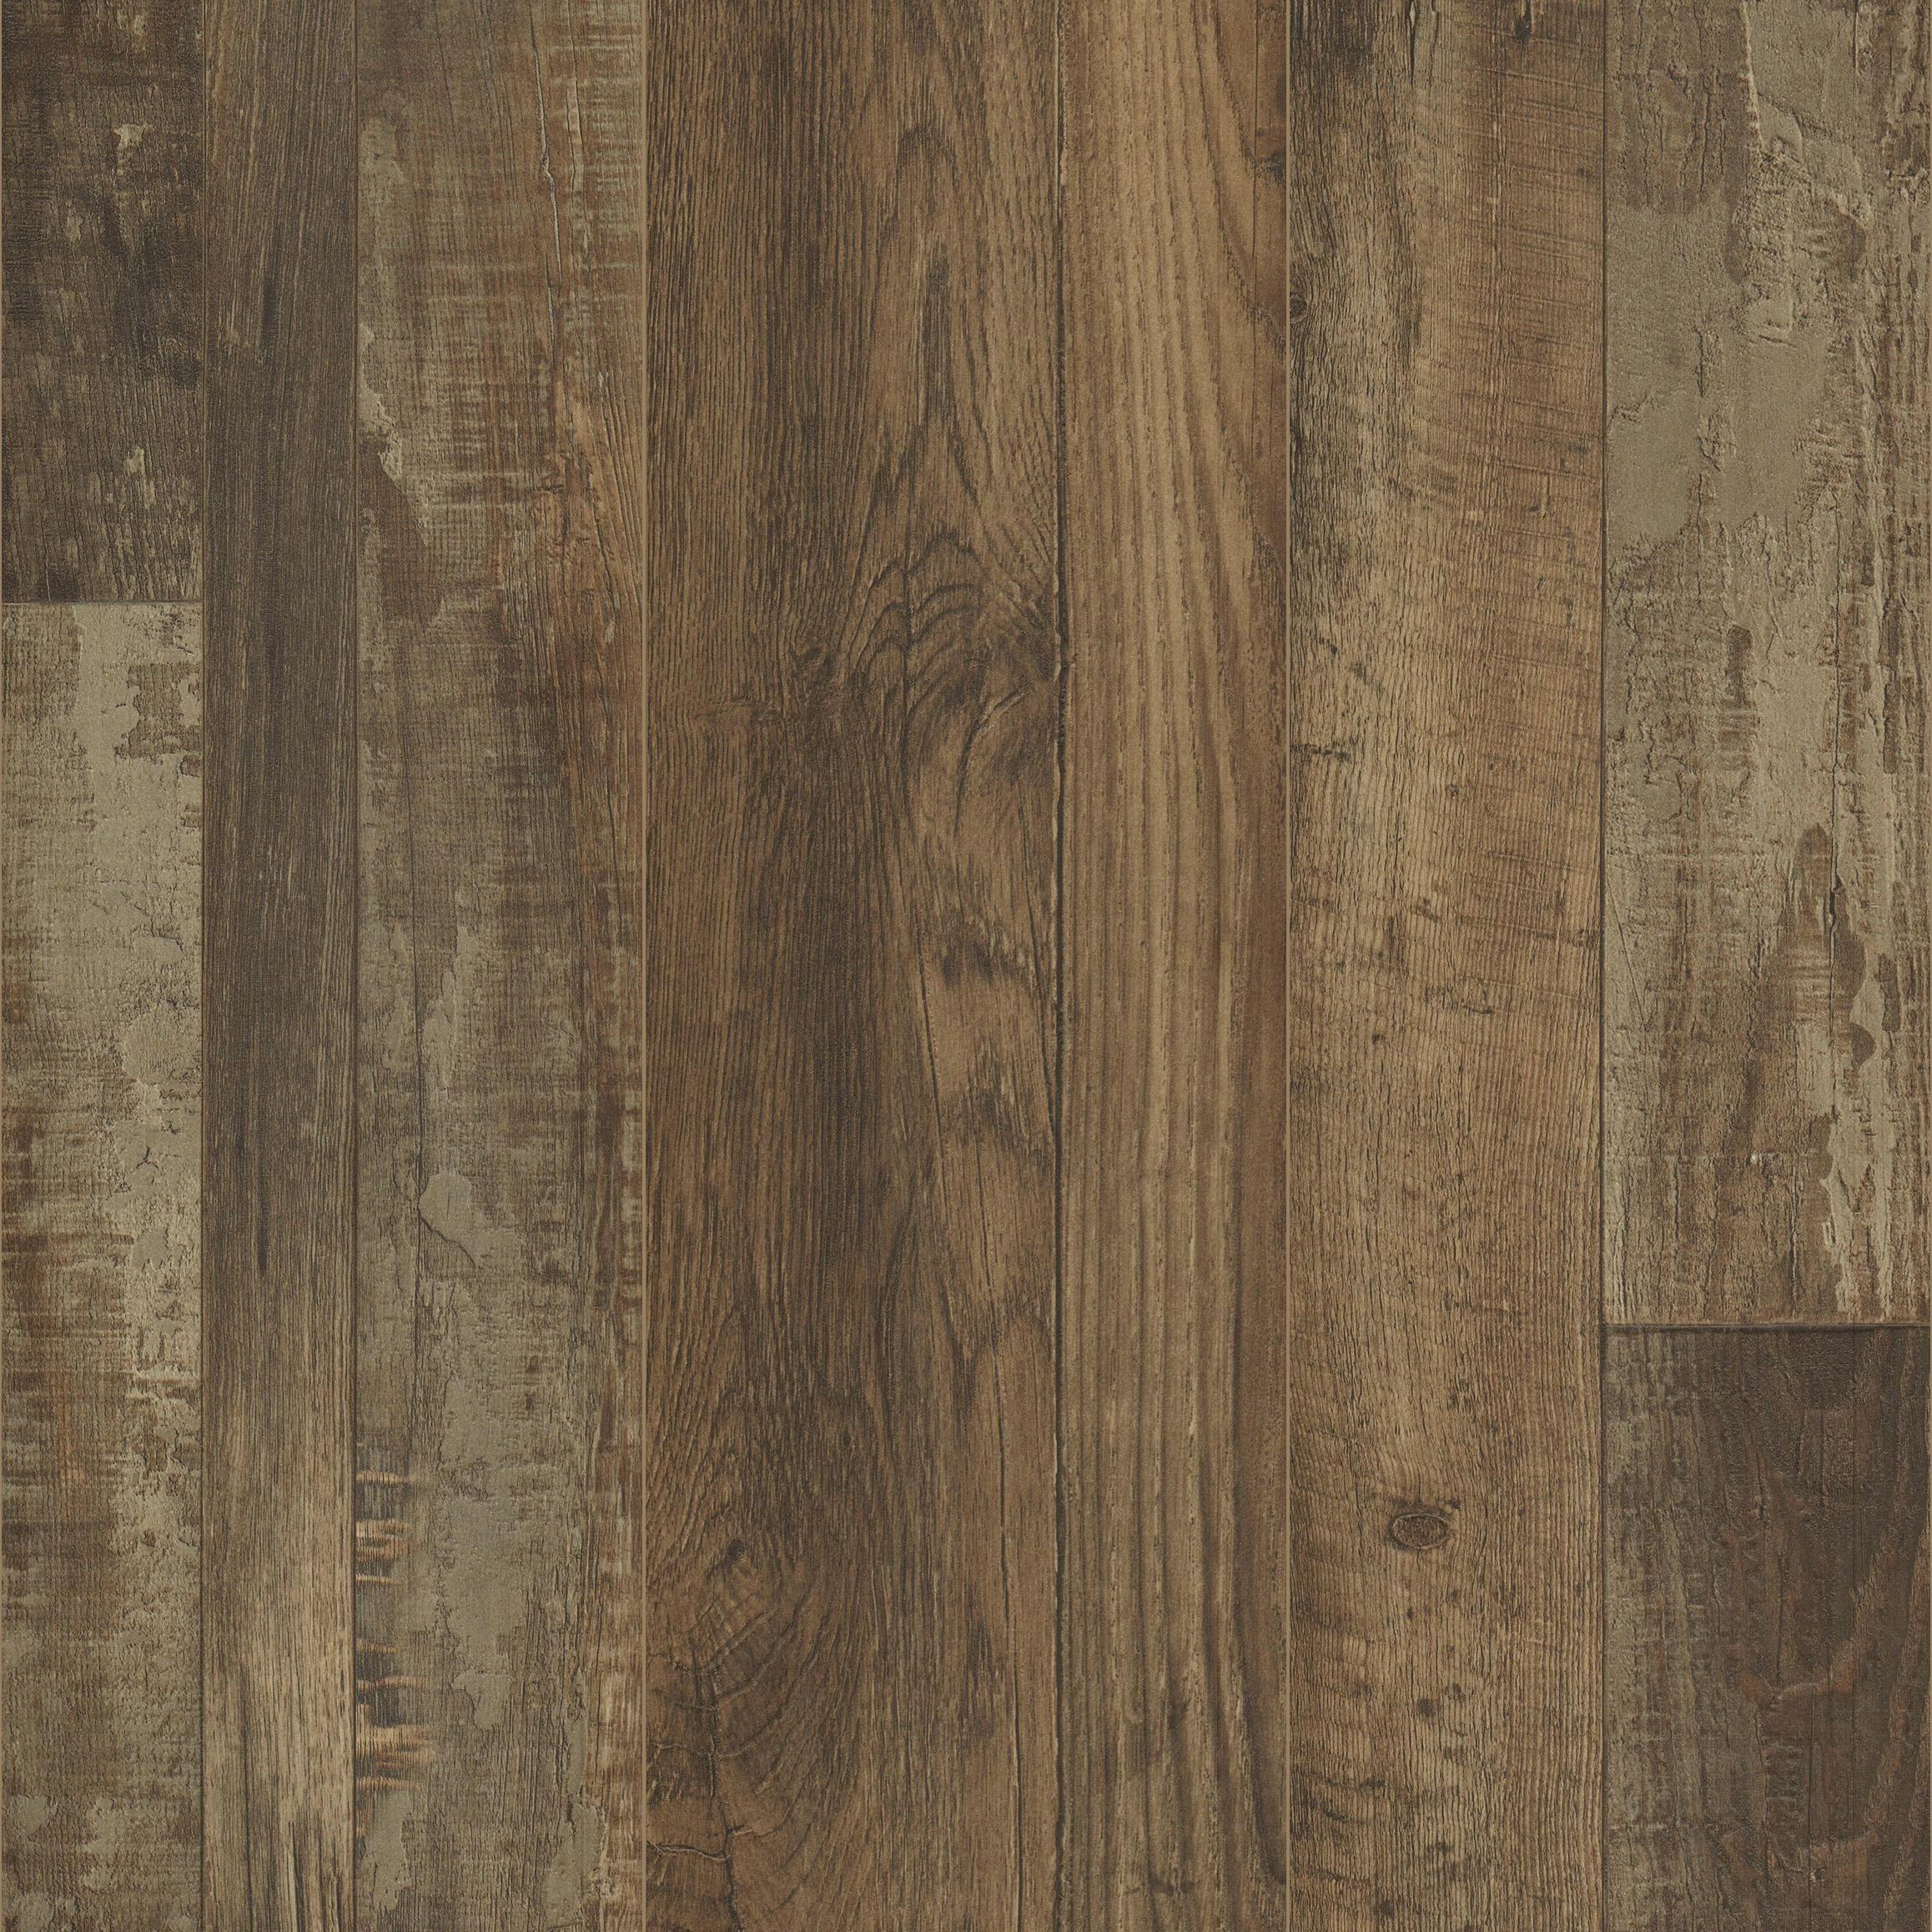 hardwood flooring store denver of superior flooring showroom top quality hardwood flooring store regarding superior flooring uniboard laminate flooring island cherry